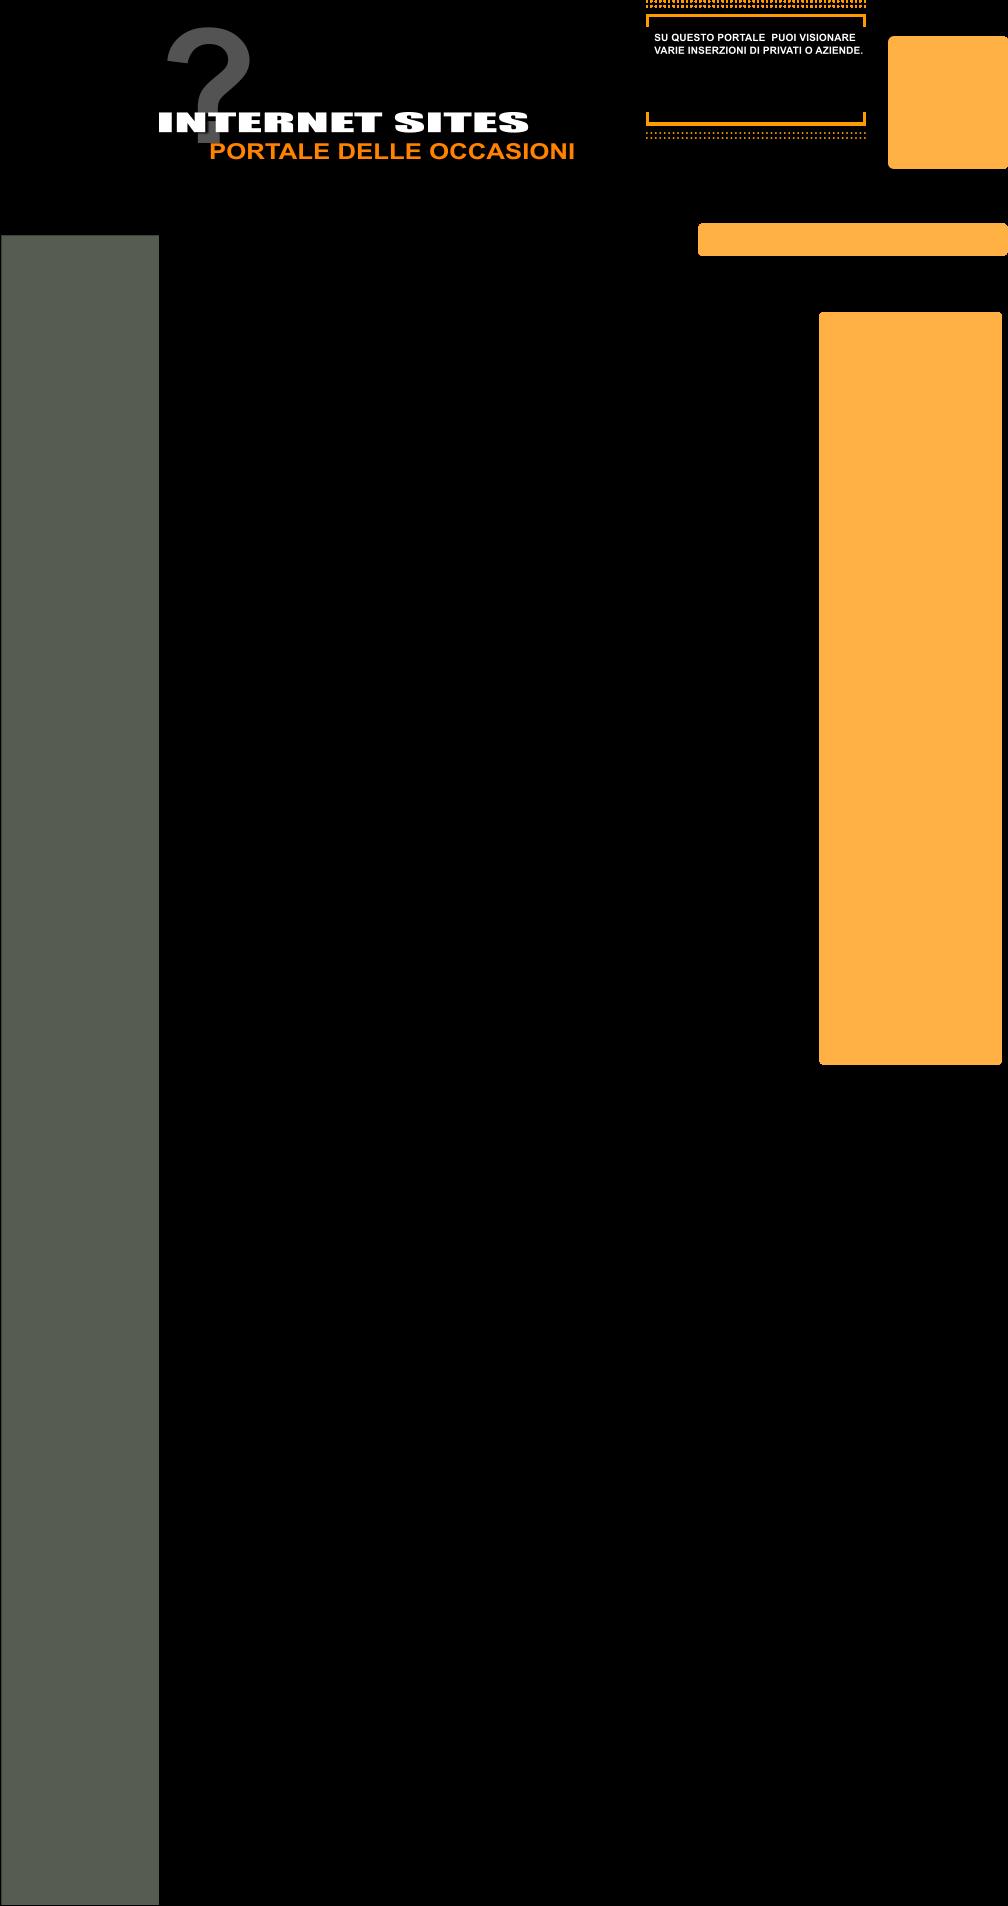 Bagni D Autore Brescia pavimenti brescia mantova verona | pavimenti mantova